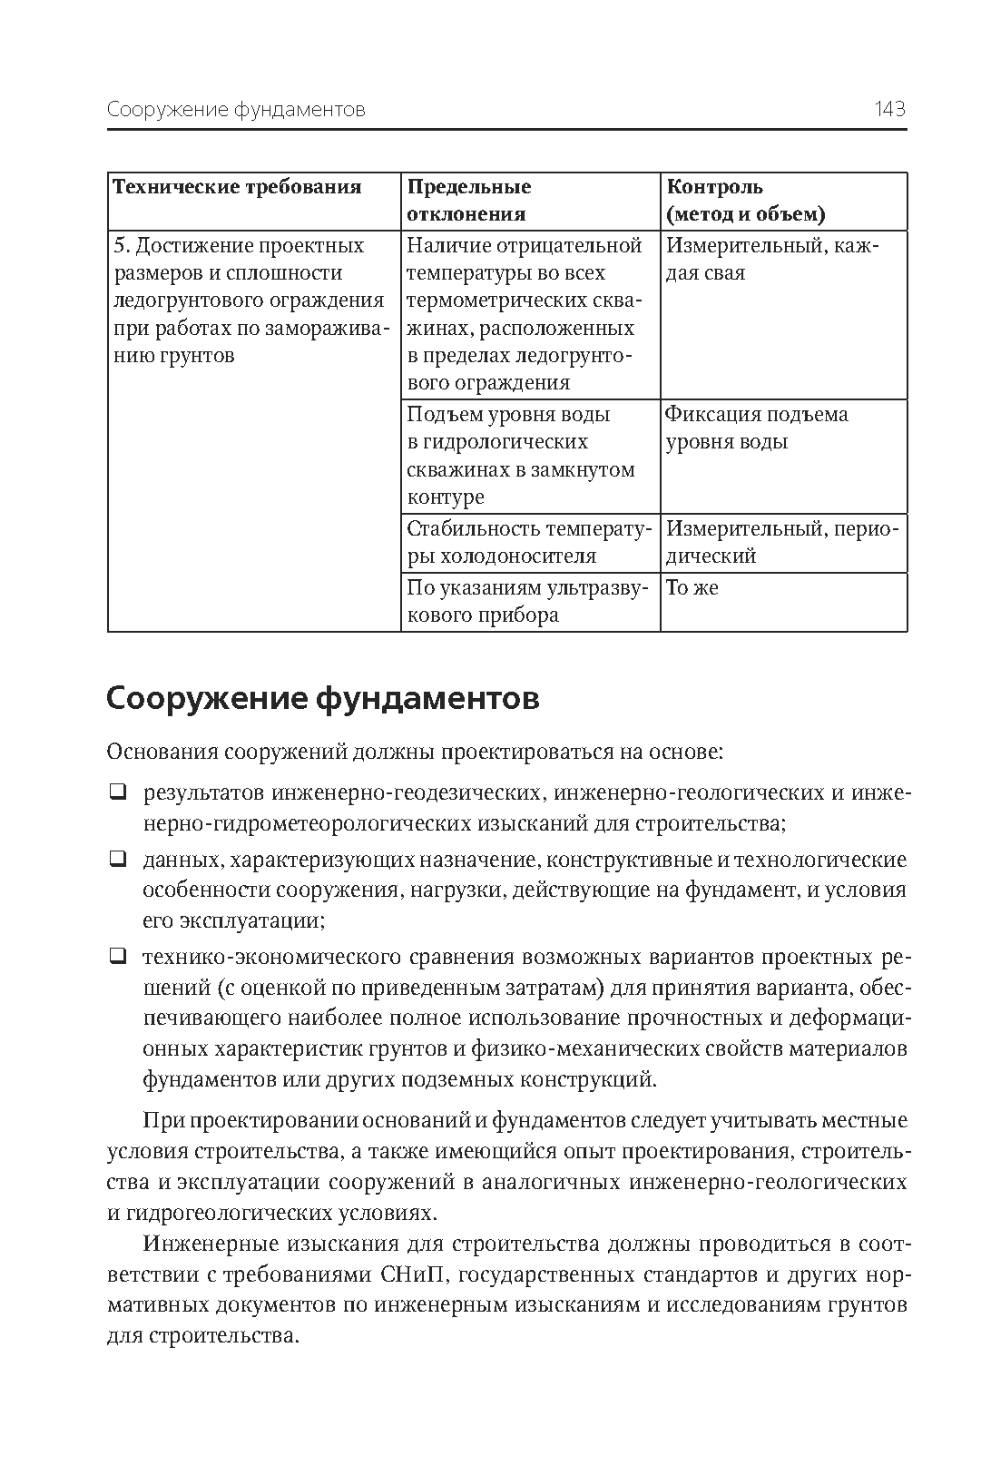 http://i6.imageban.ru/out/2013/11/04/fc0aa951787a6d40da33edf7bb465f2e.jpg